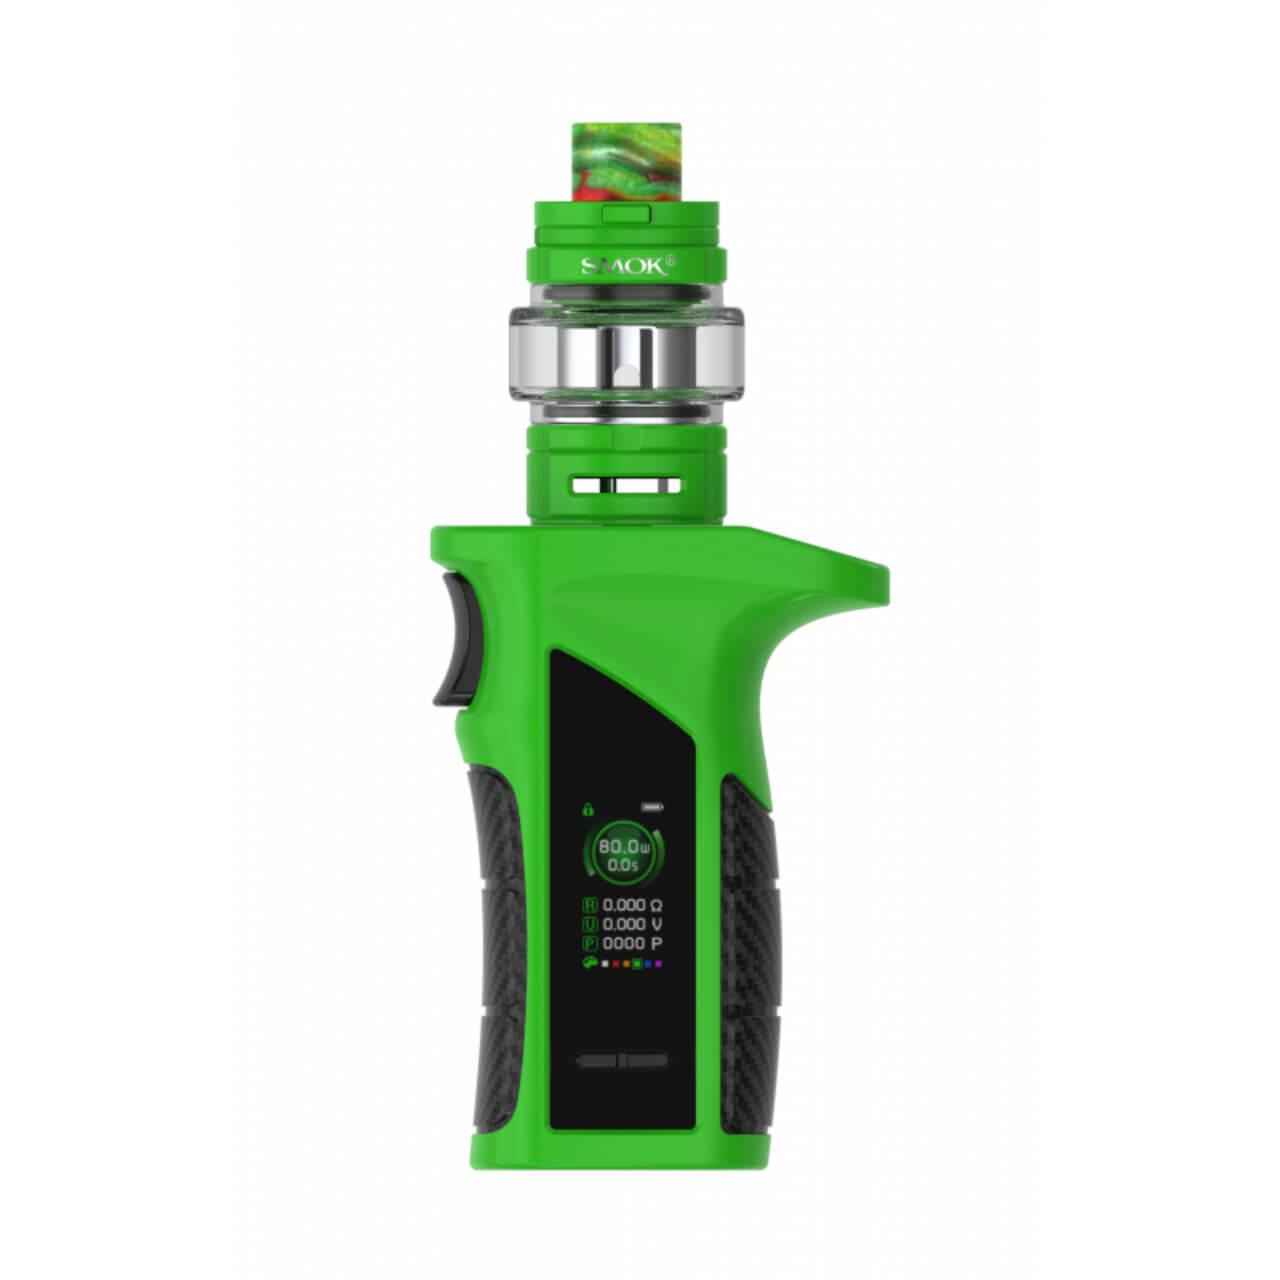 SMOK MAG P3 MINI Kit Green